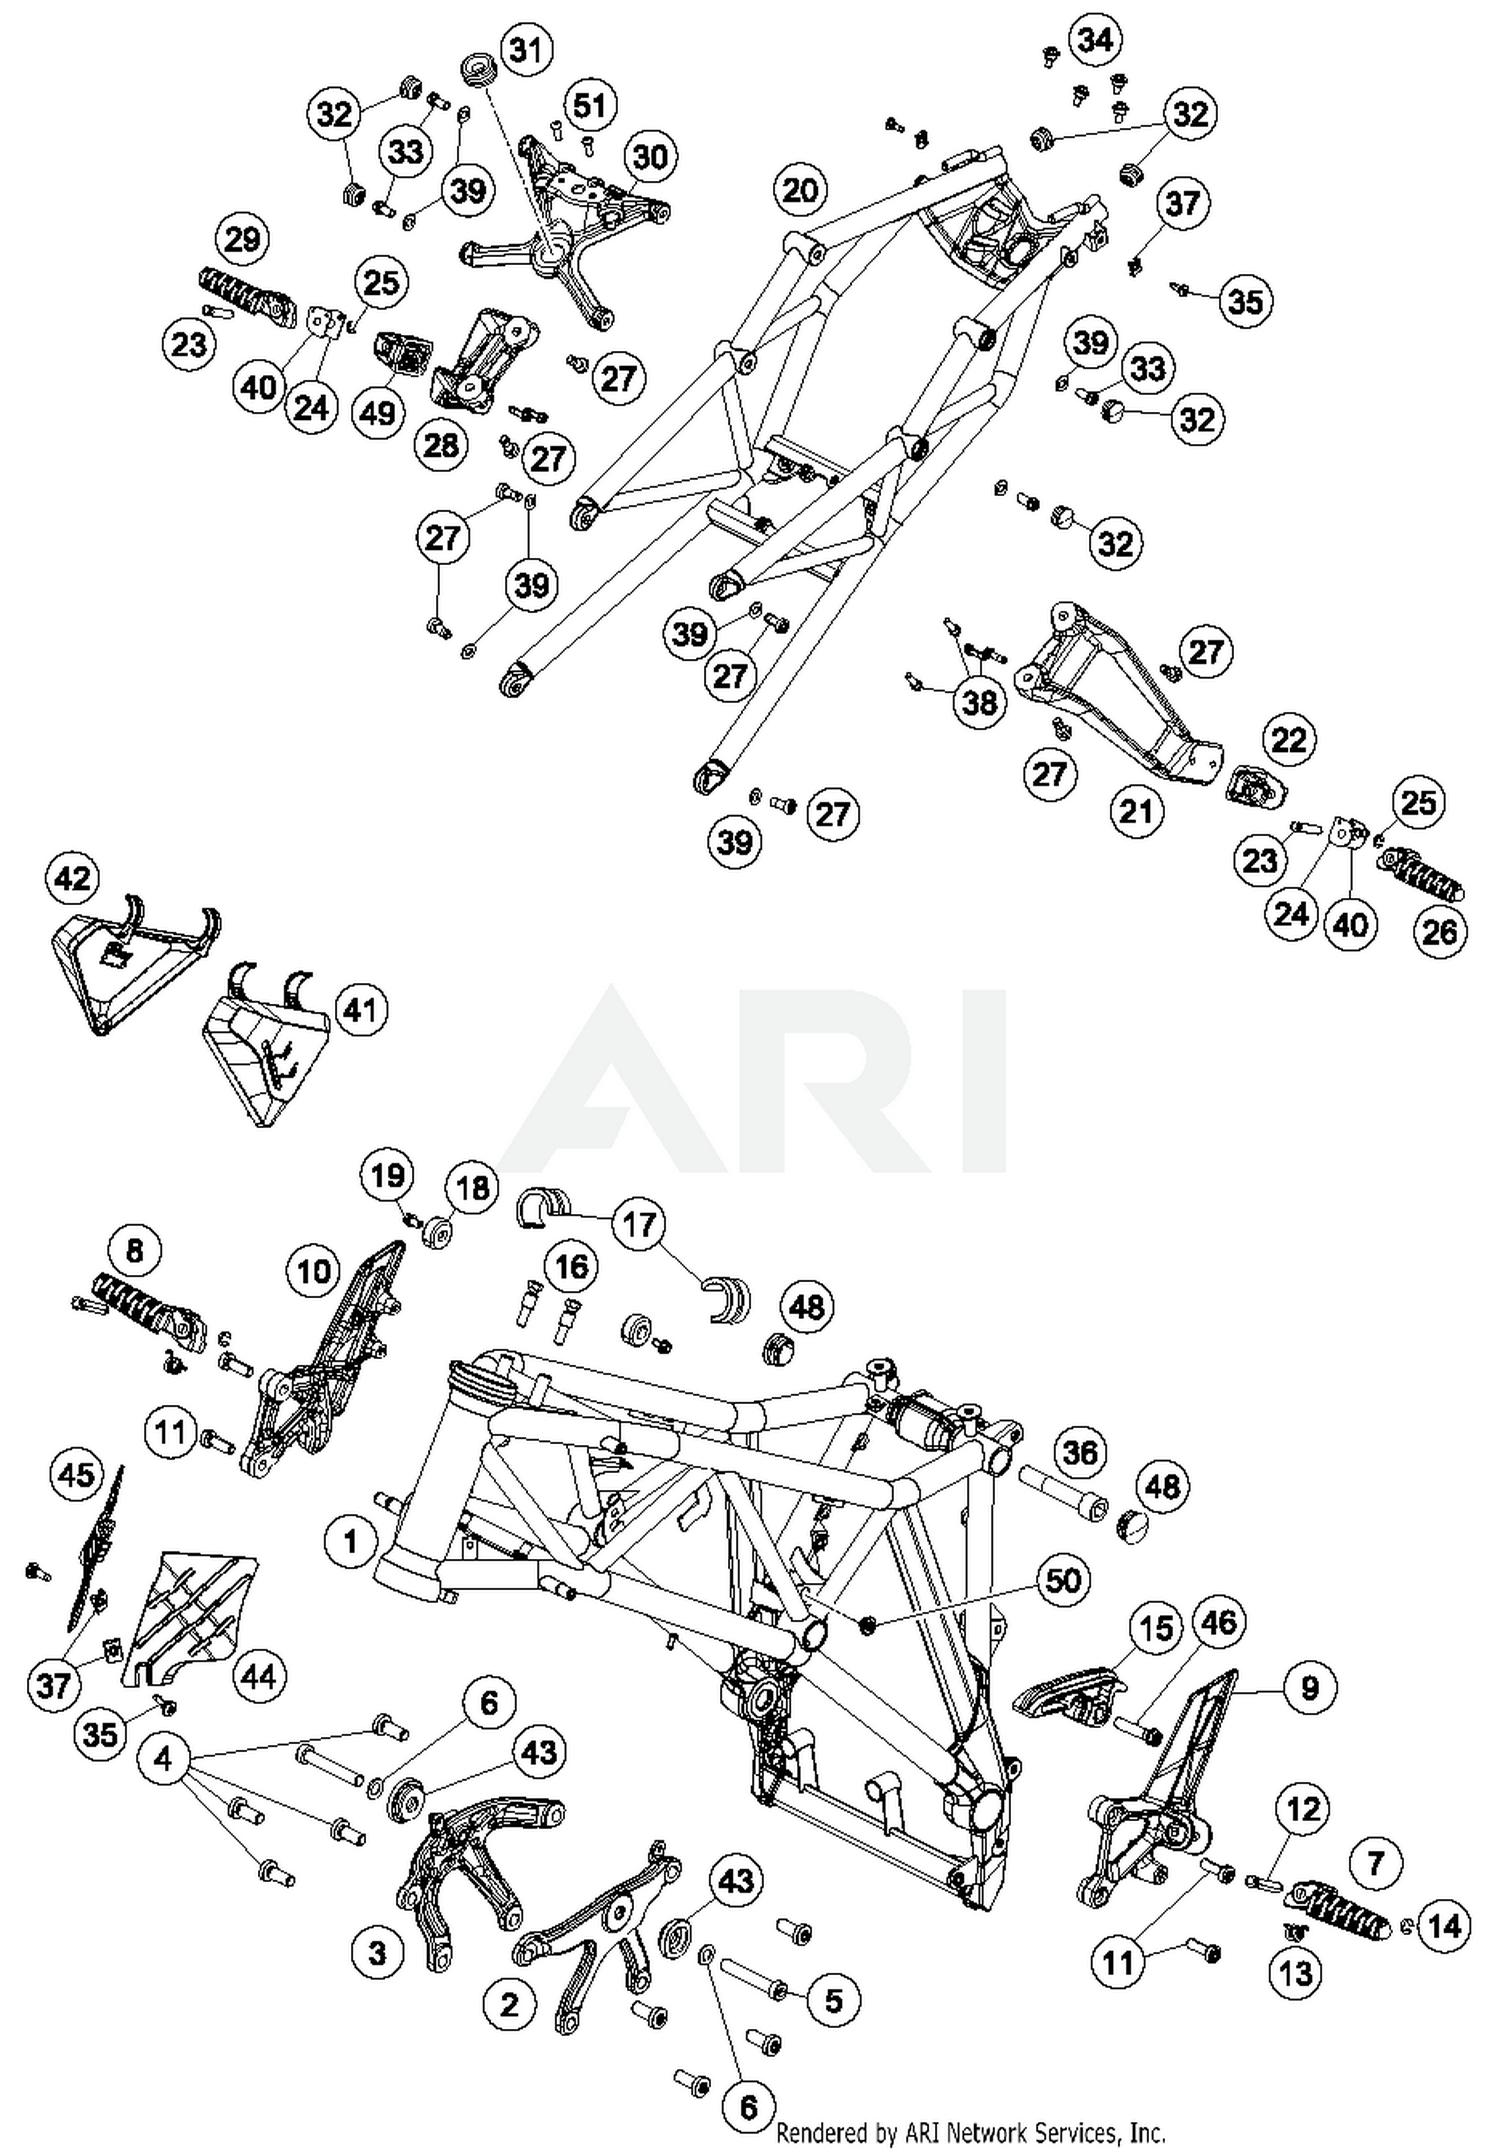 Cannondale Atv Wiring Schematic